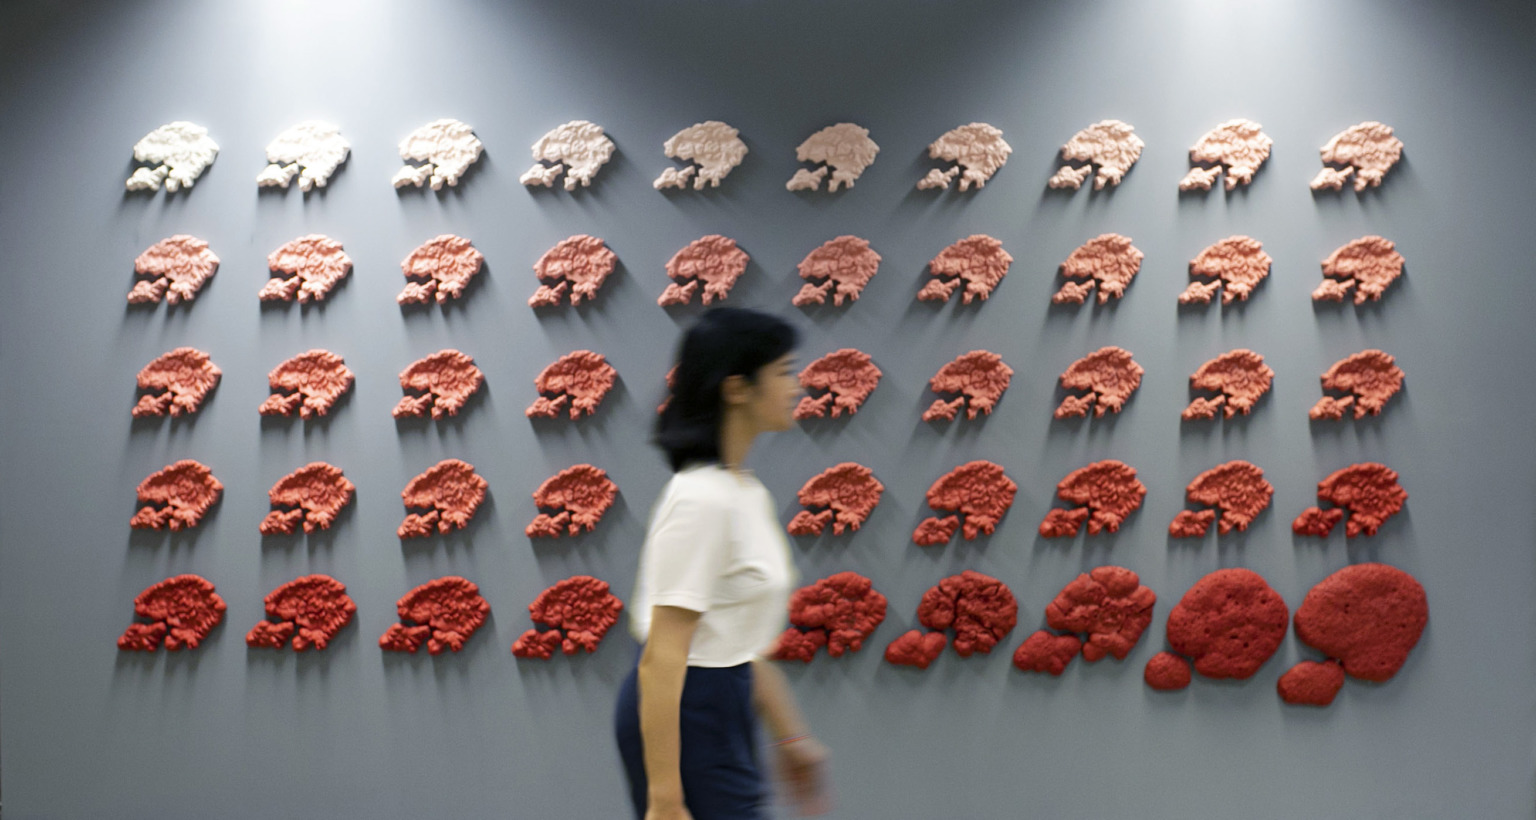 Five rows of circular sculptural forms.